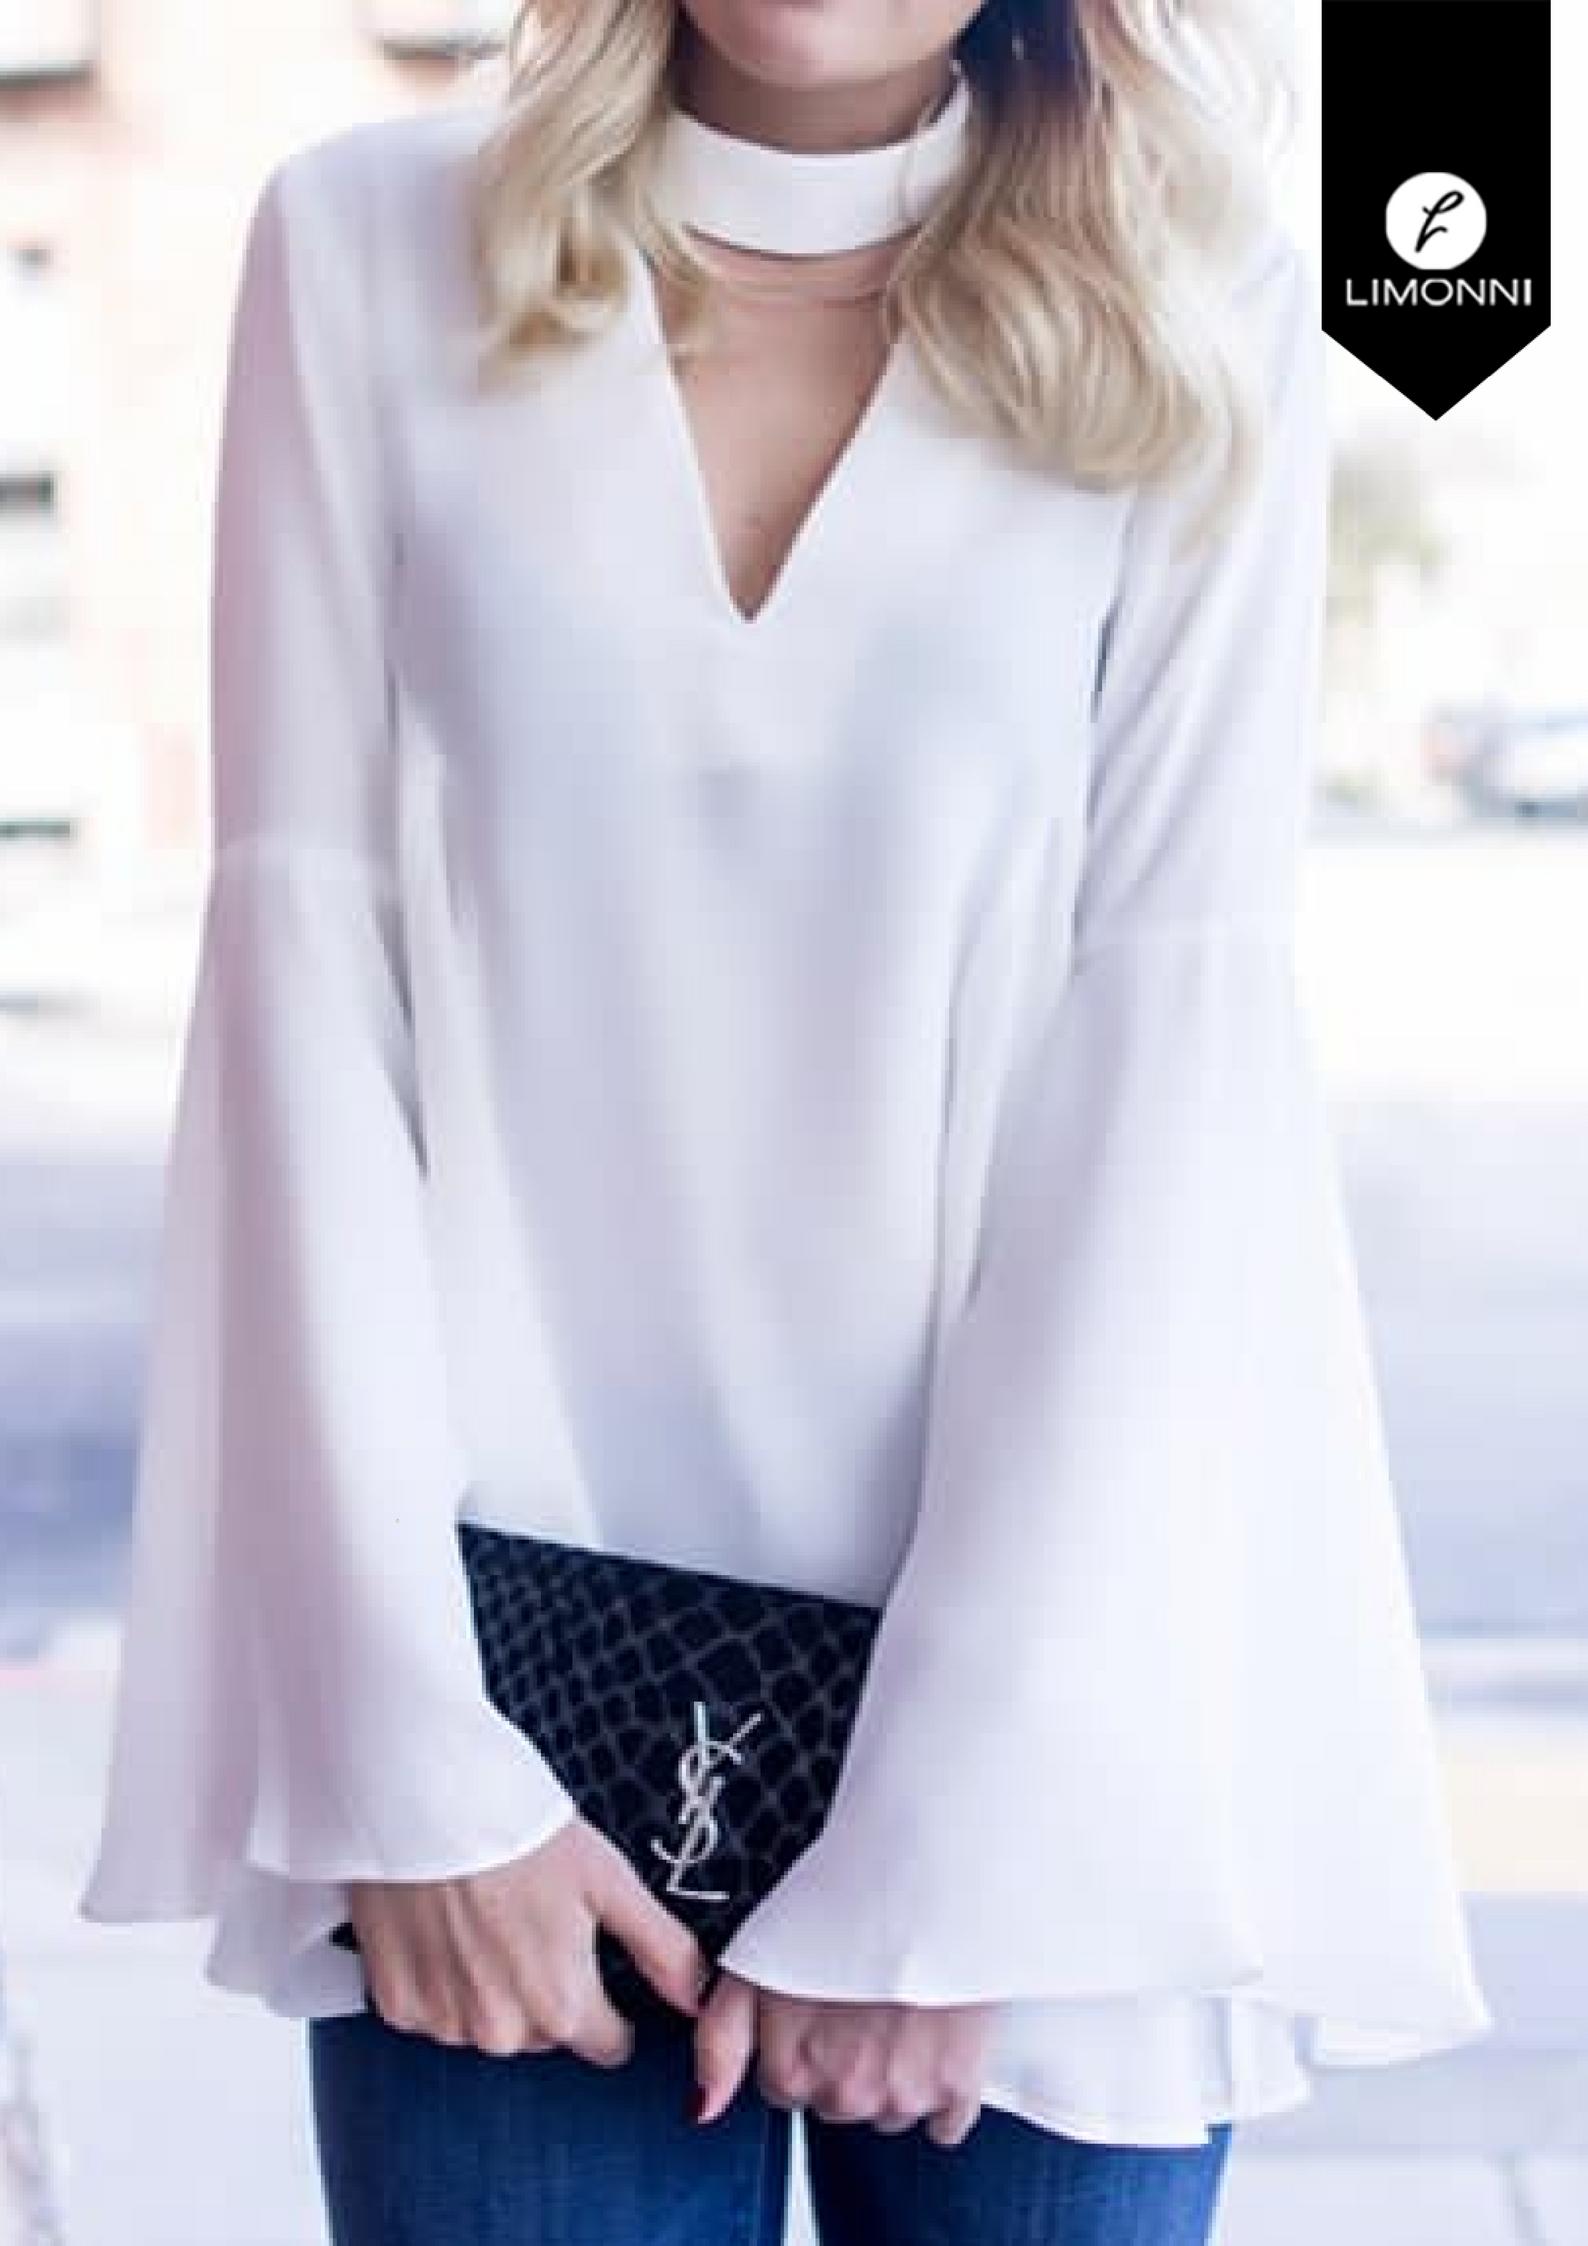 Blusas para mujer Limonni Bennett LI1397 Casuales